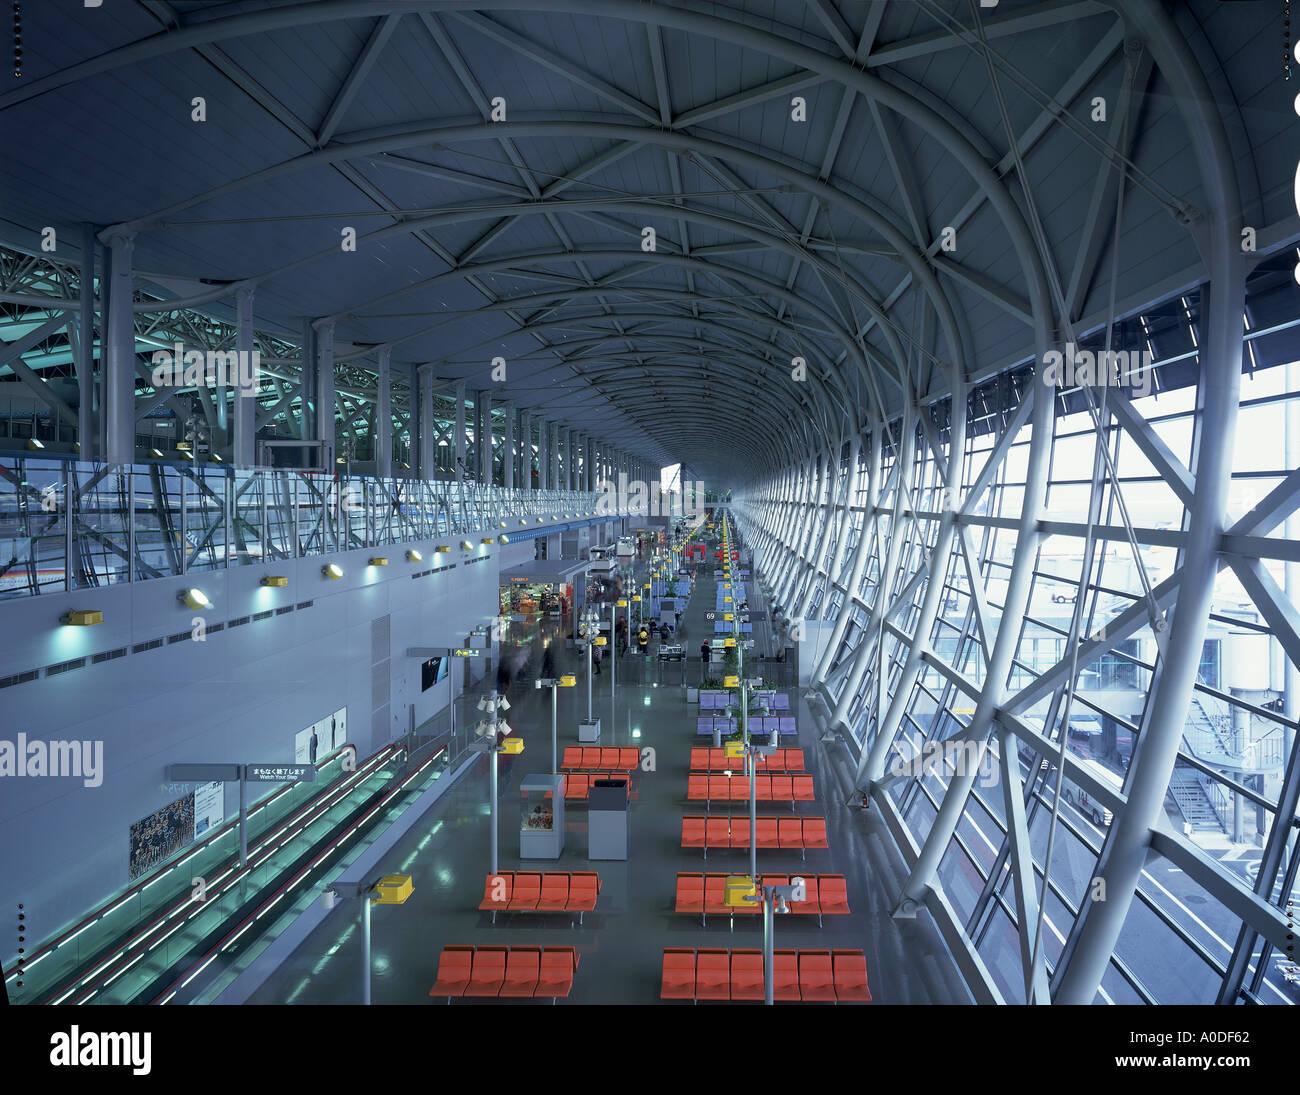 Aeroporto Osaka Renzo Piano : Kansai airport osaka japan interior architect renzo